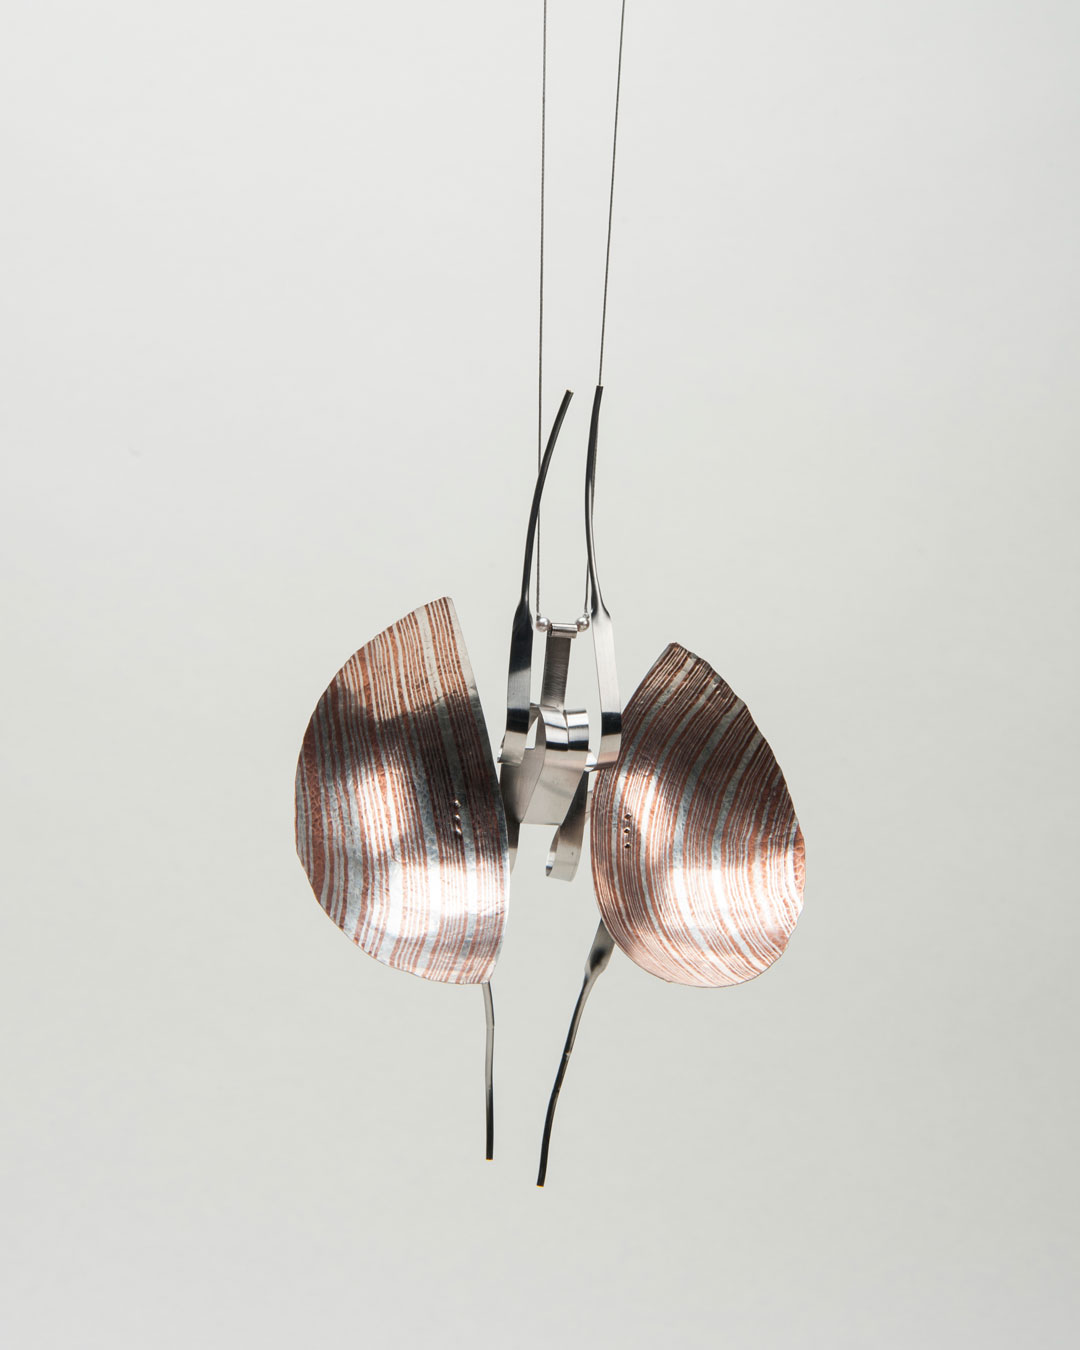 Andrea Wippermann, Mantis Religiosa, 2018, pendant; silver, copper, blackened silver, stainless steel, beads, nylon, 190 x 130 x 50 mm, €4600